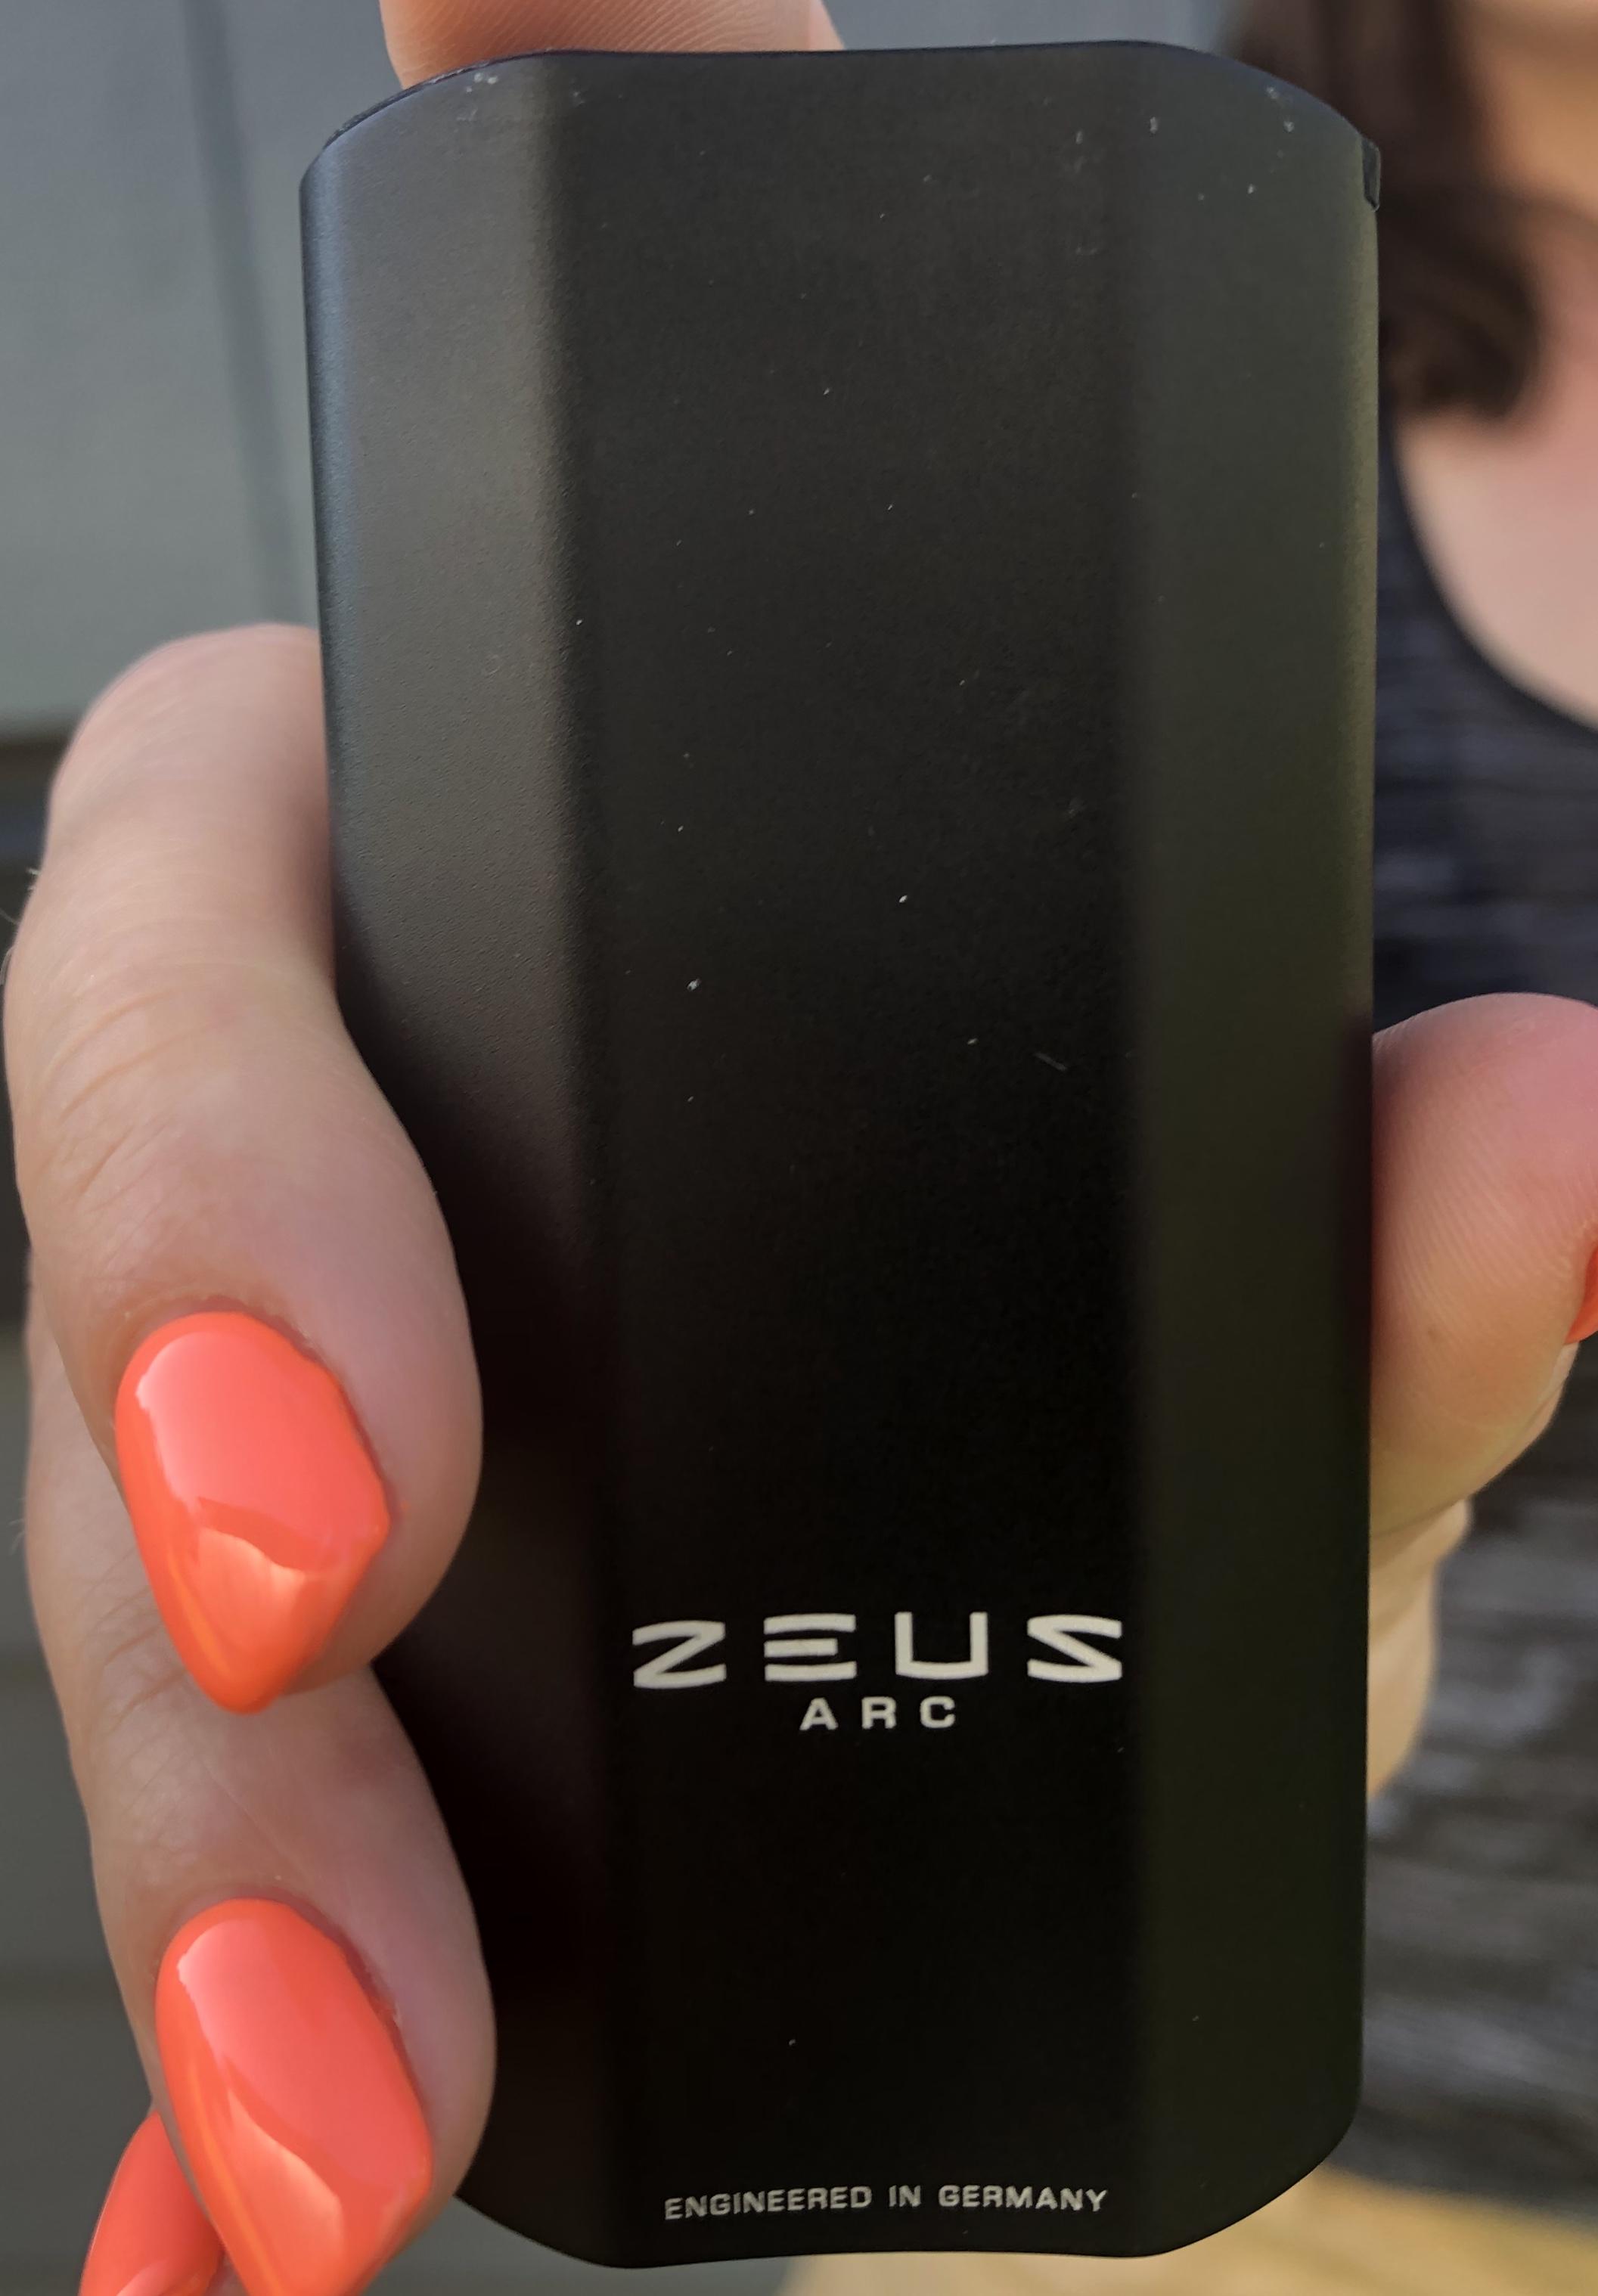 Zeus Arc Vaporizer